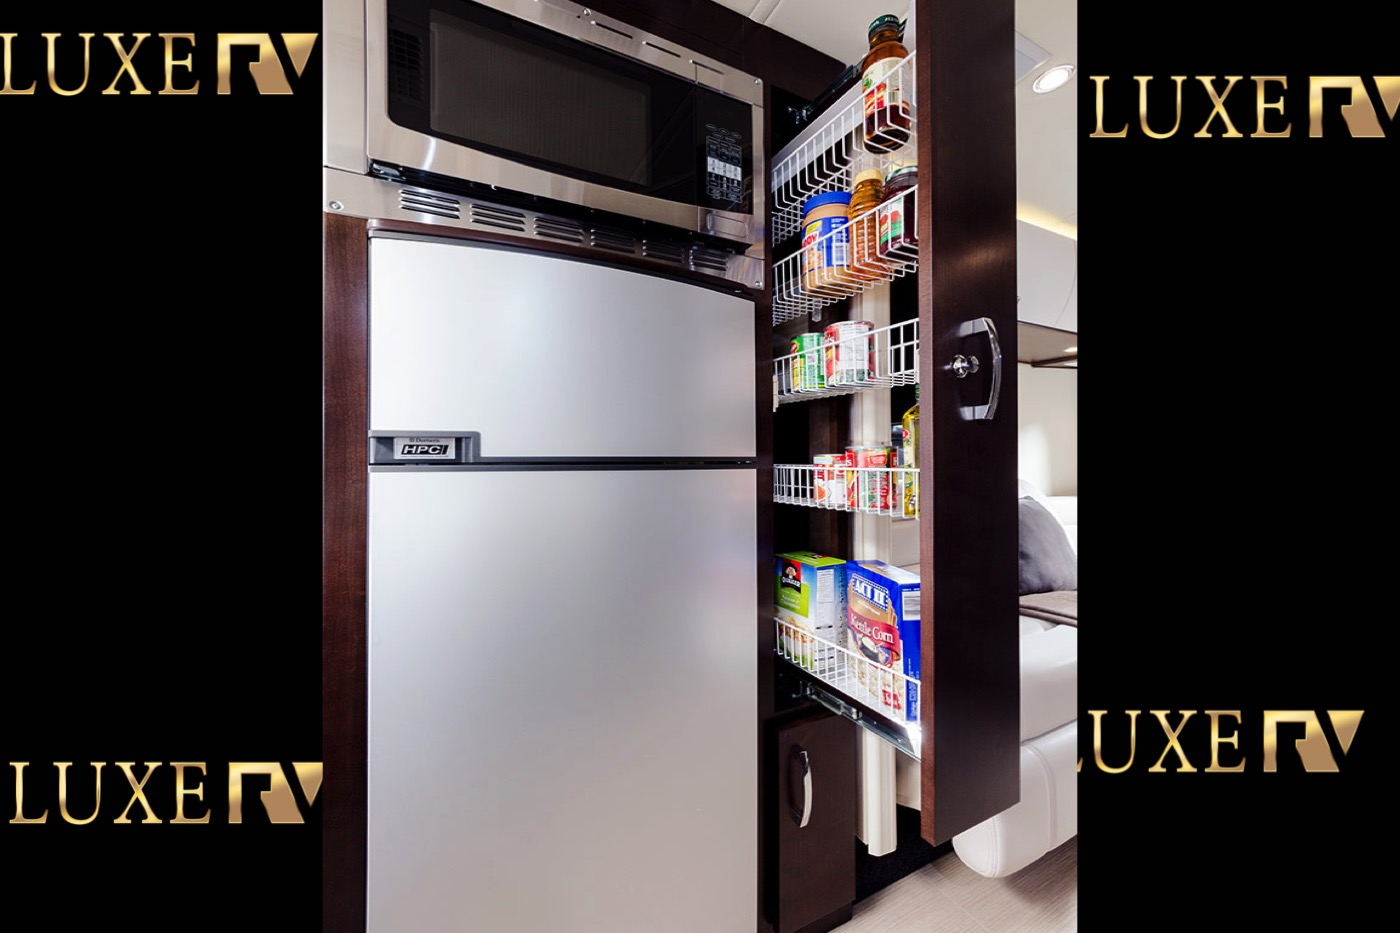 RV Rental Serenity Luxe RV